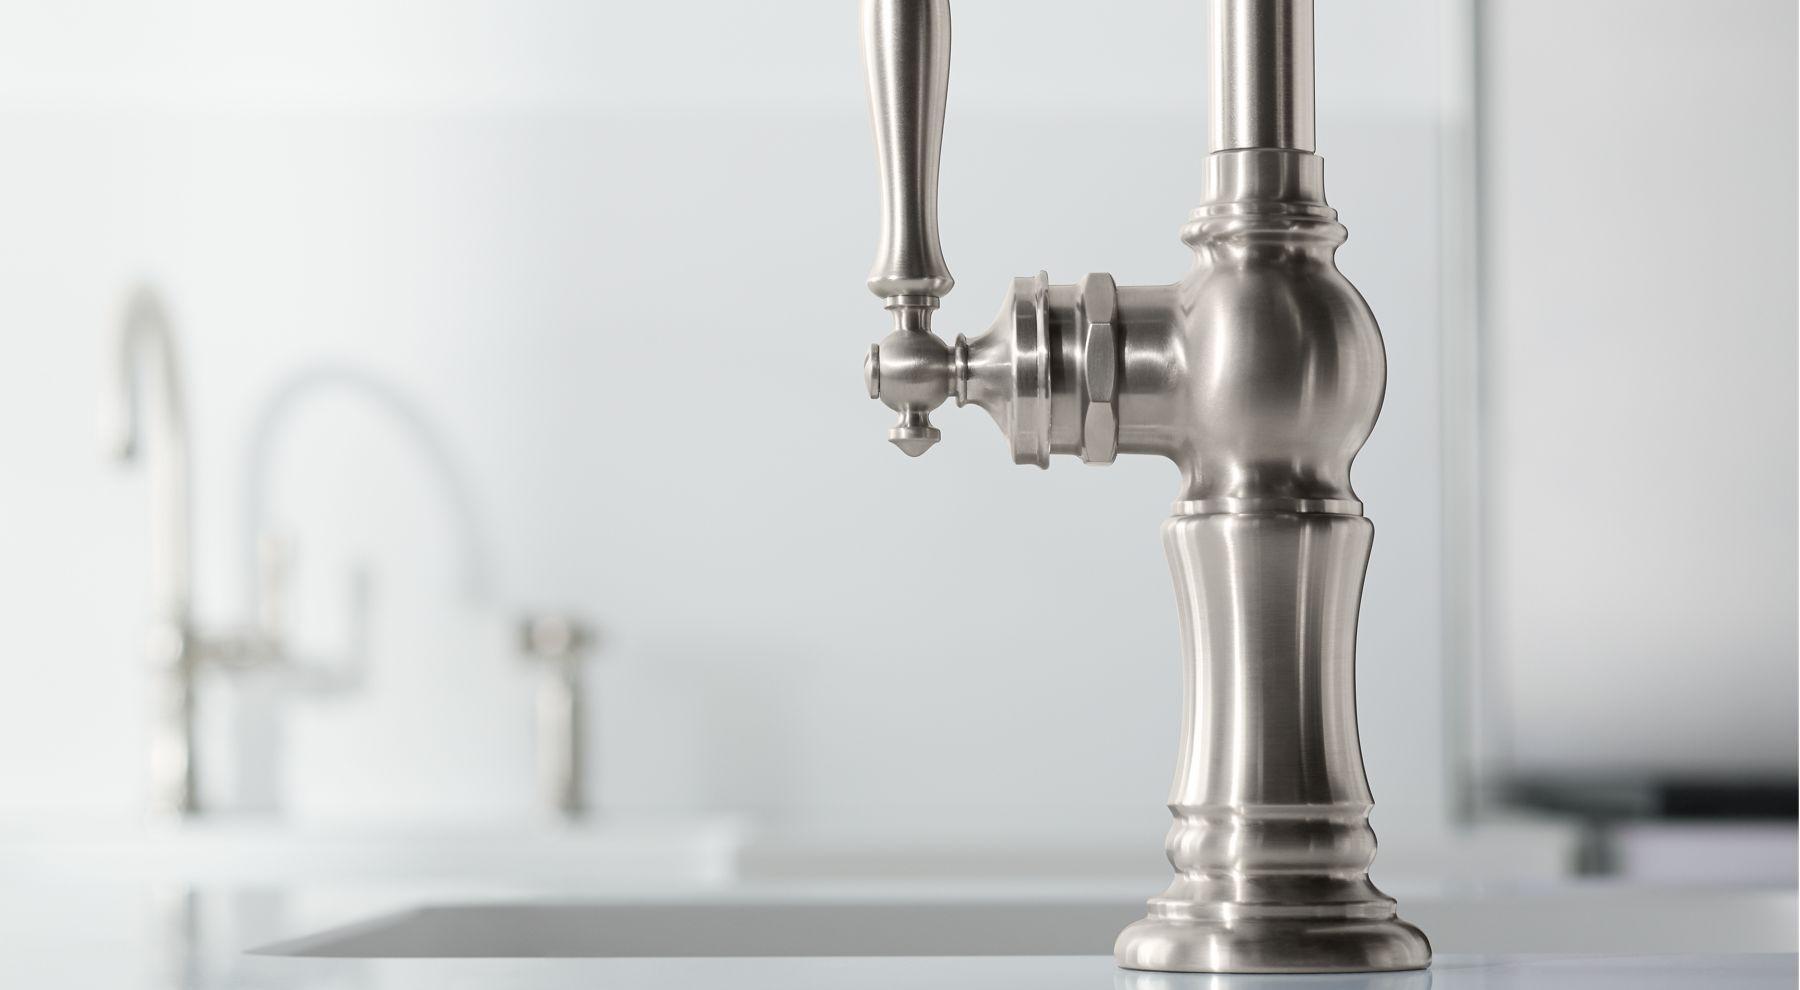 Kohler Brass Kitchen Faucet Kitchen Faucet Form Guide Kitchen Kohler